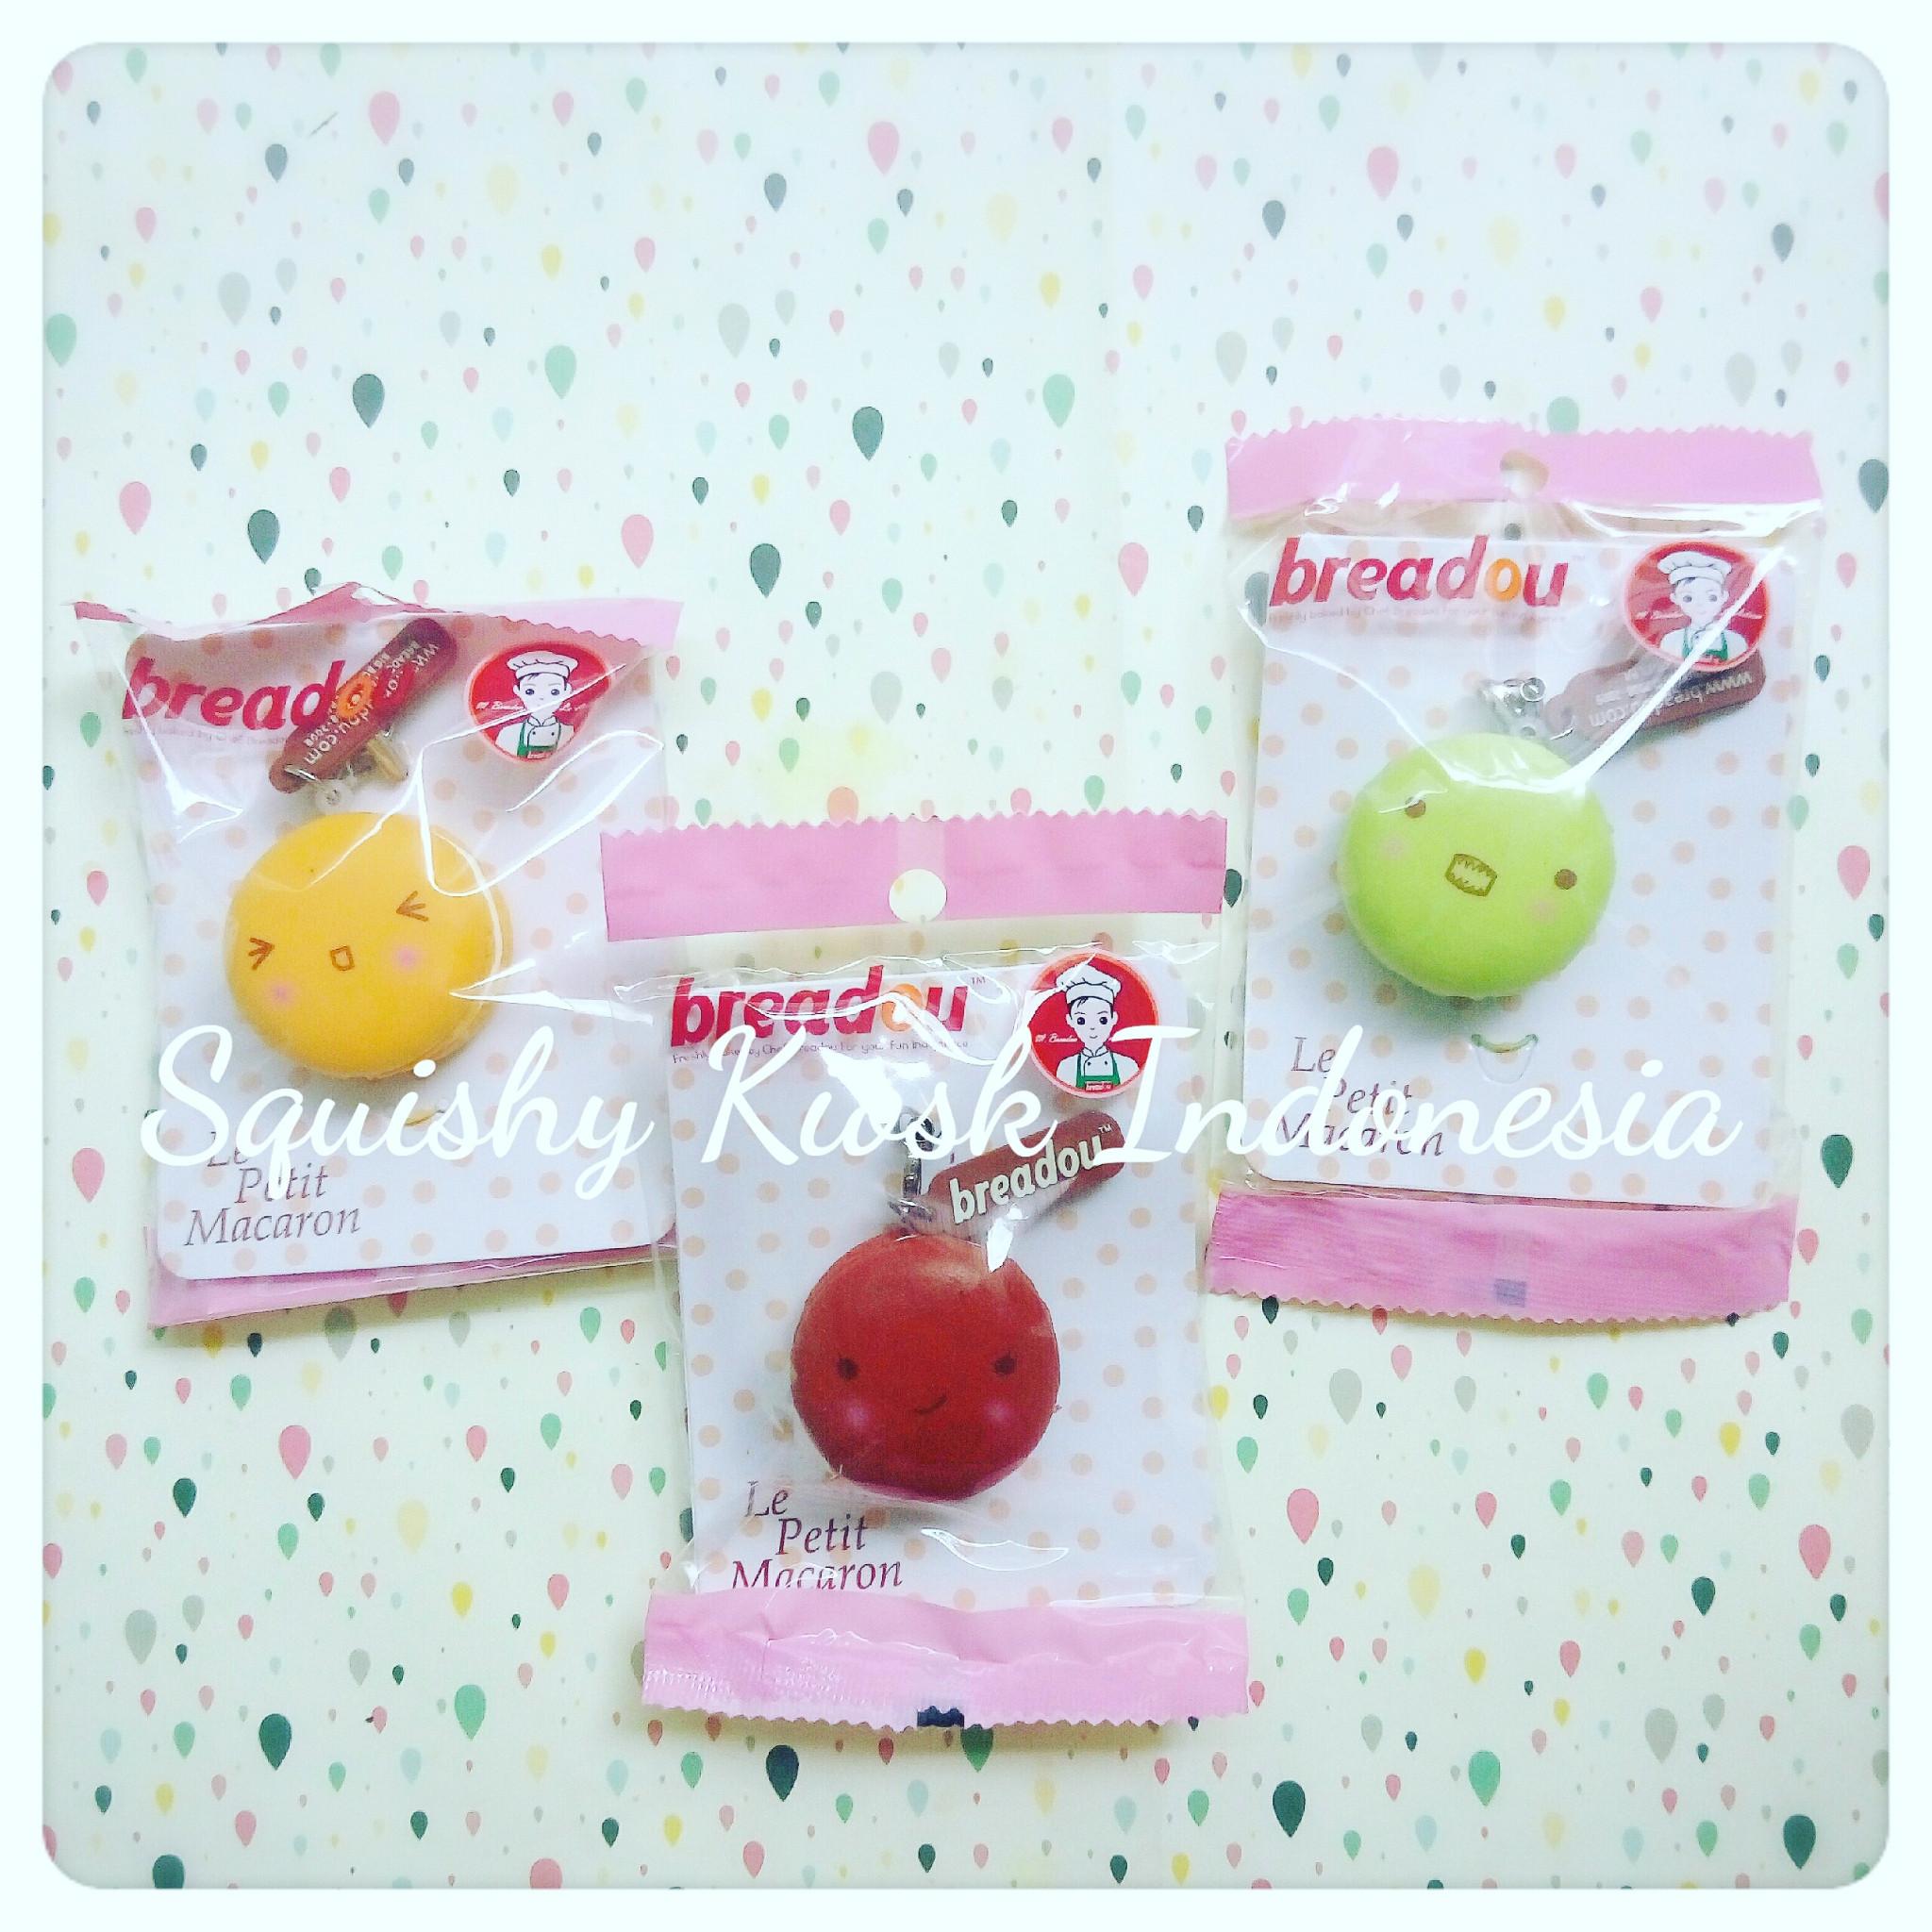 Breadou Squishy Tag : Jual Breadou Le Petit Macaron Squishy (keychain/toy) - Squishy Kiosk Indonesia Tokopedia